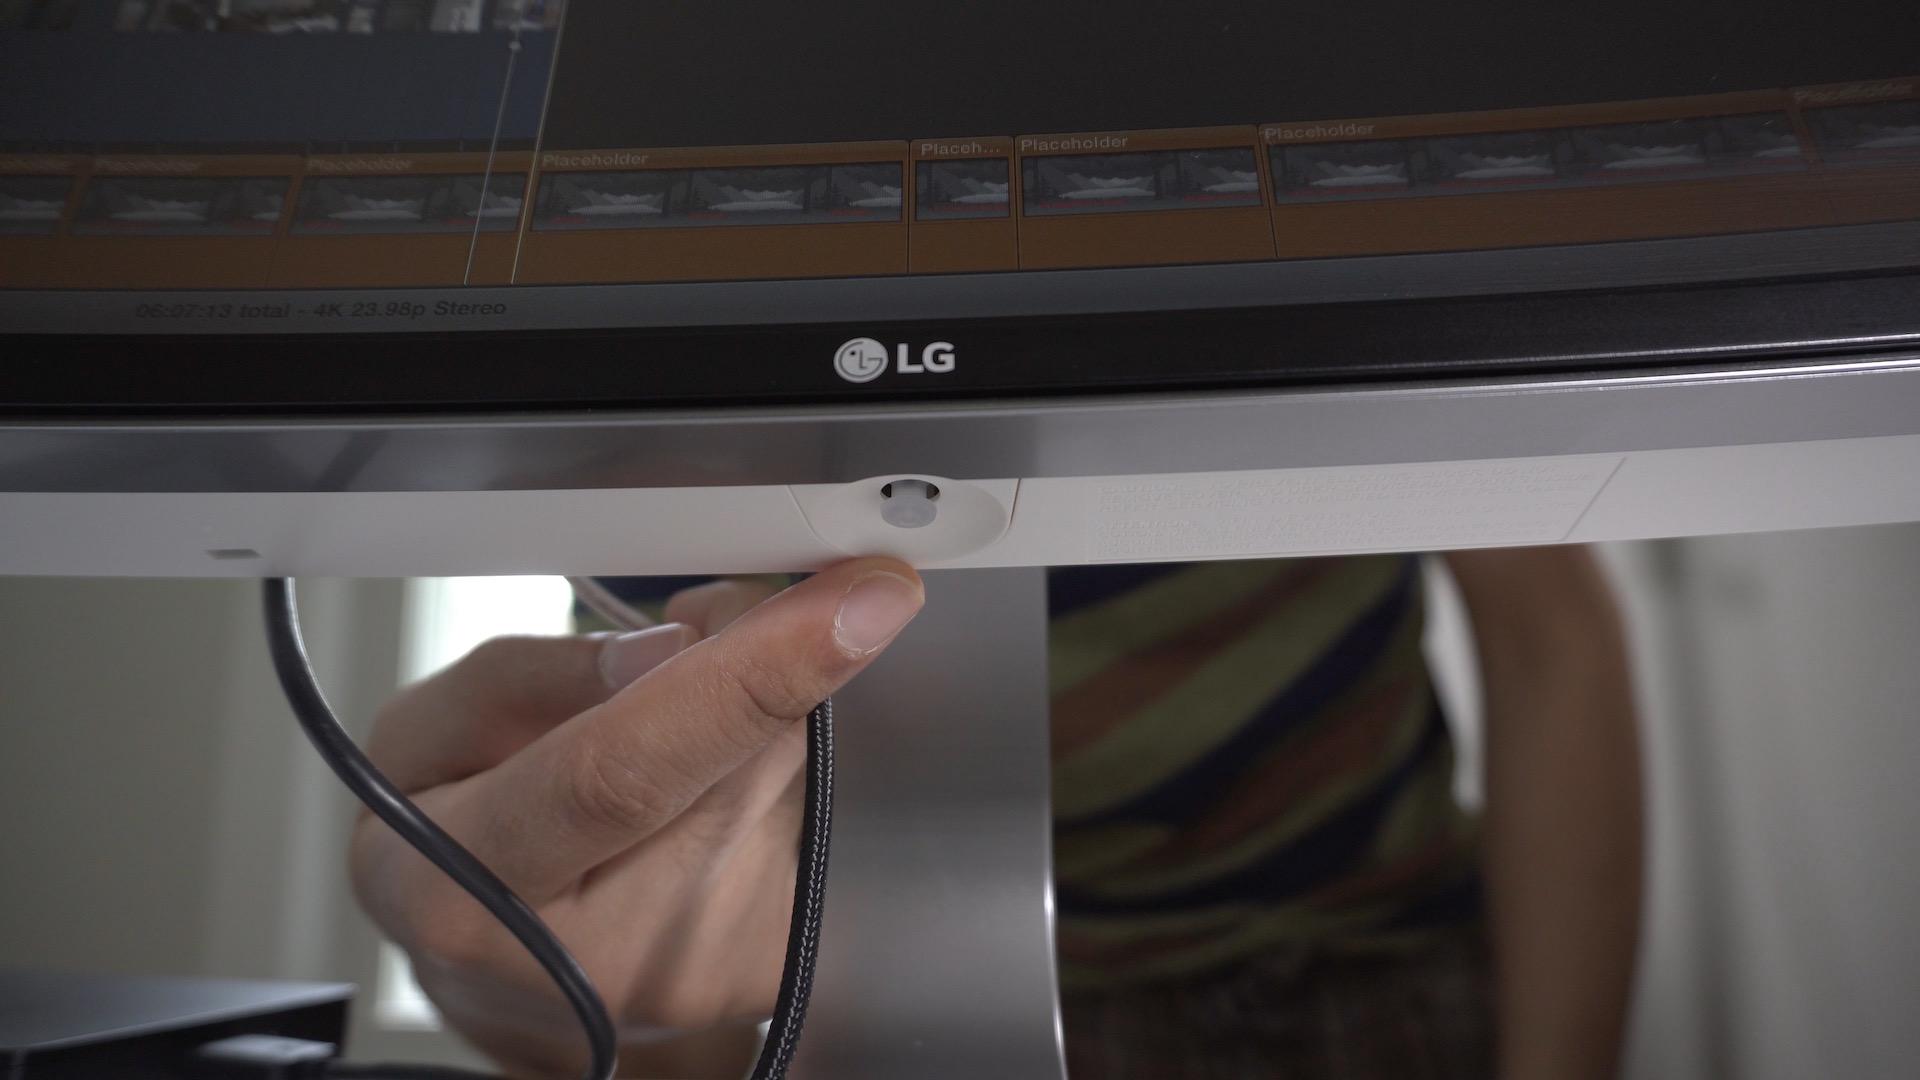 LG UltraWide Joystick